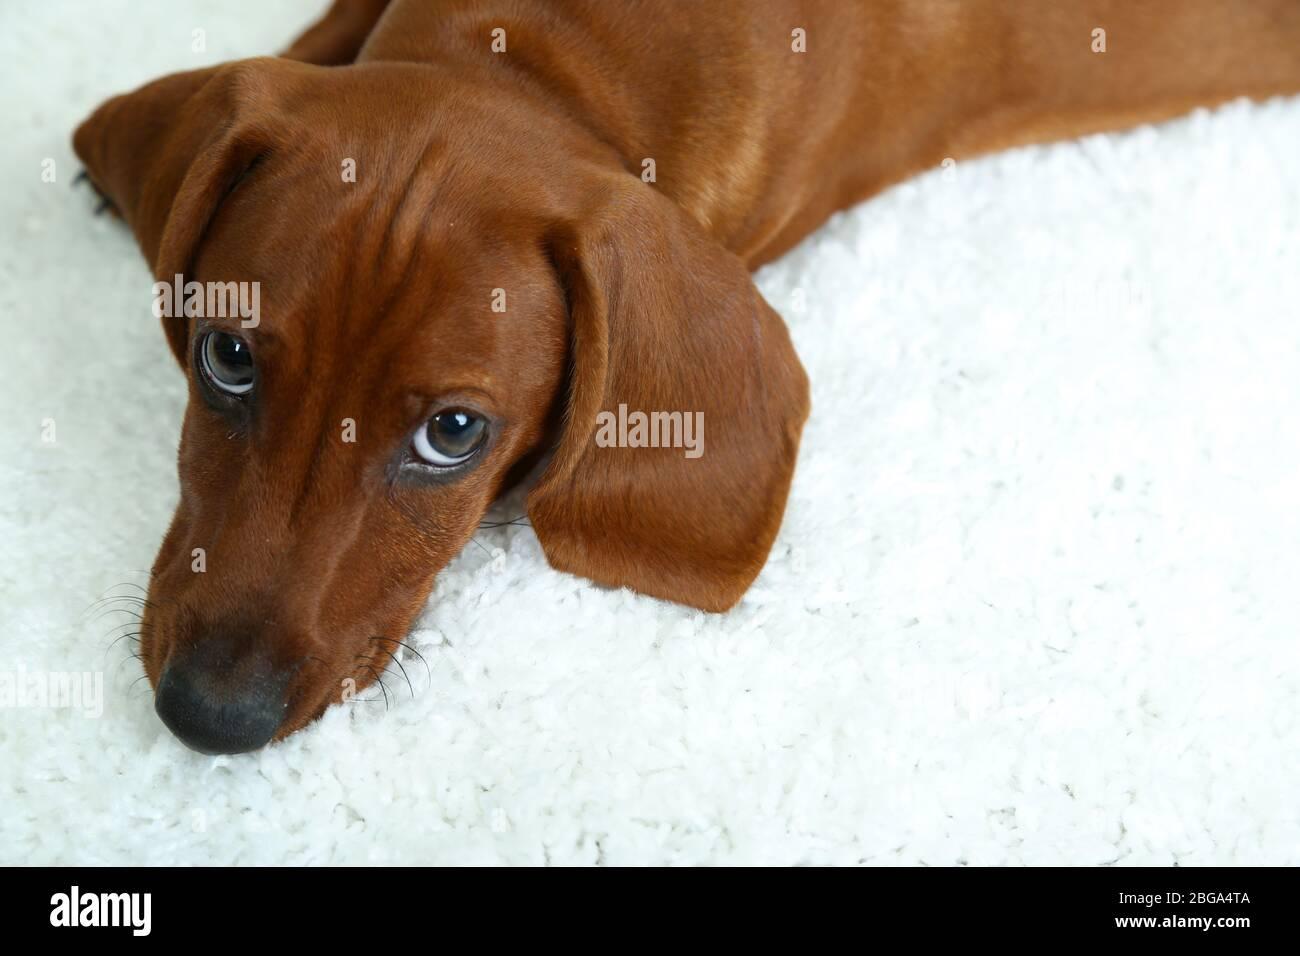 Cute Dachshund Puppy On White Carpet Stock Photo Alamy